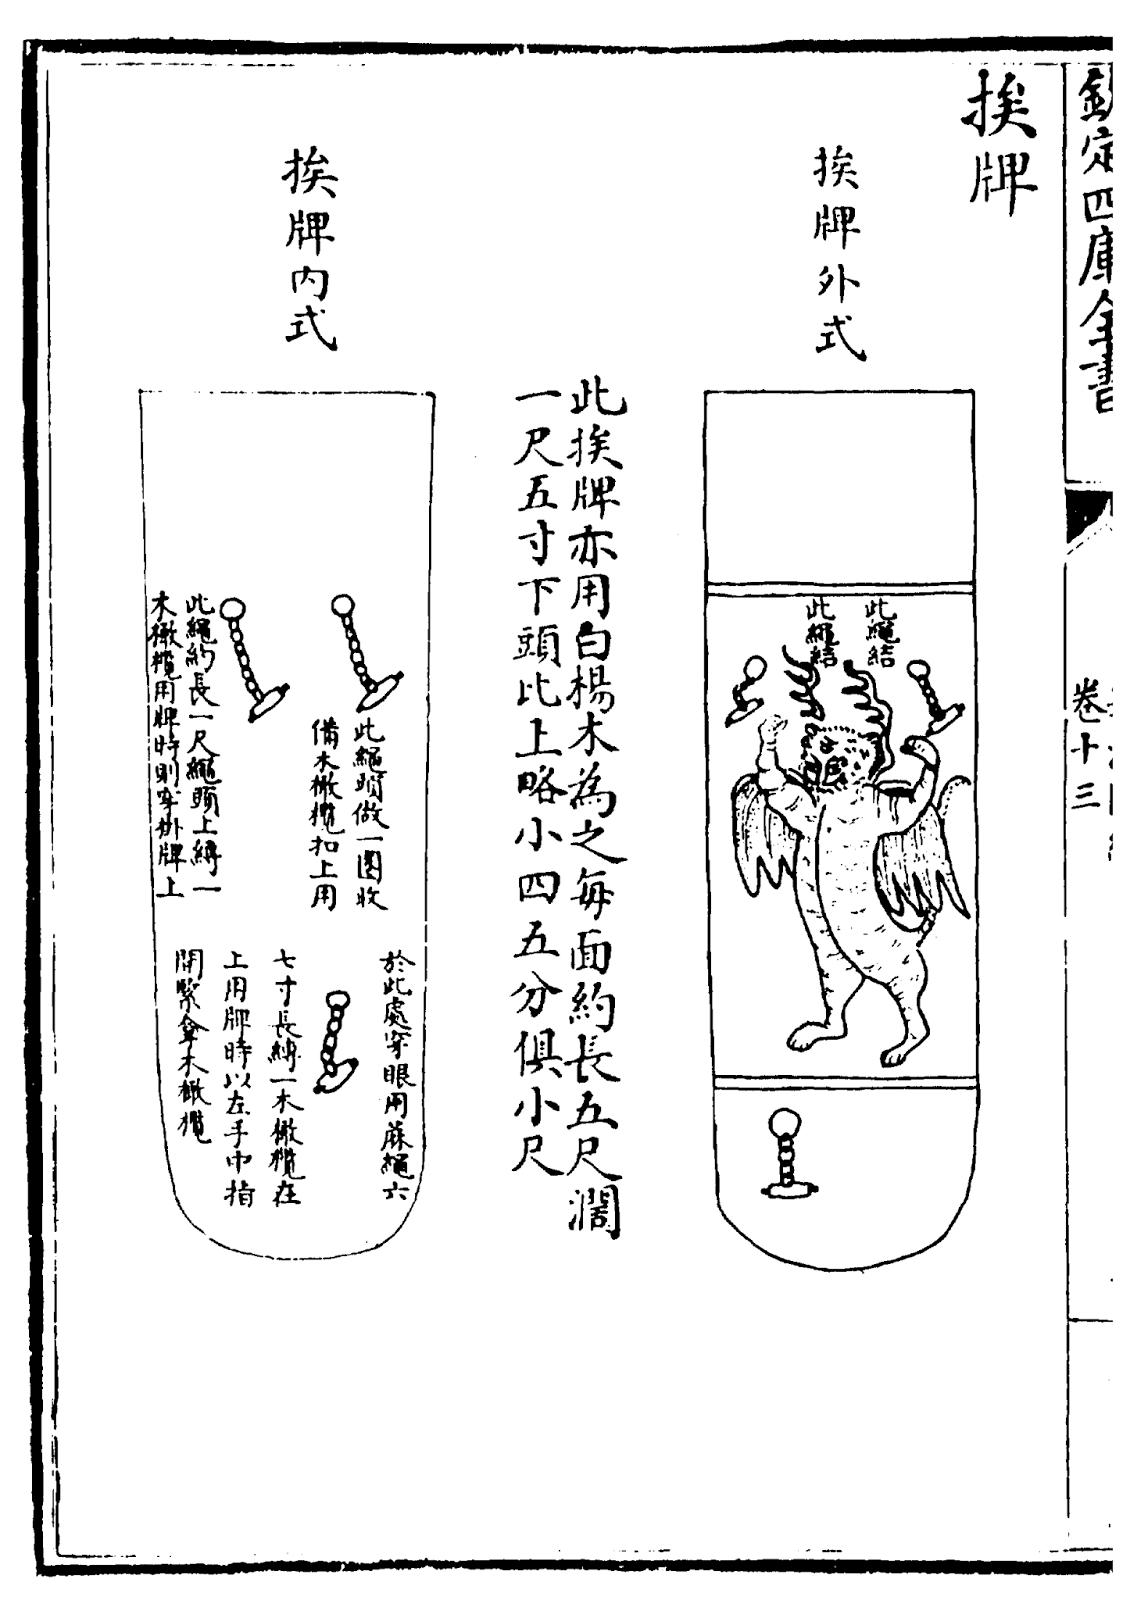 Ming Dynasty Ai Pai